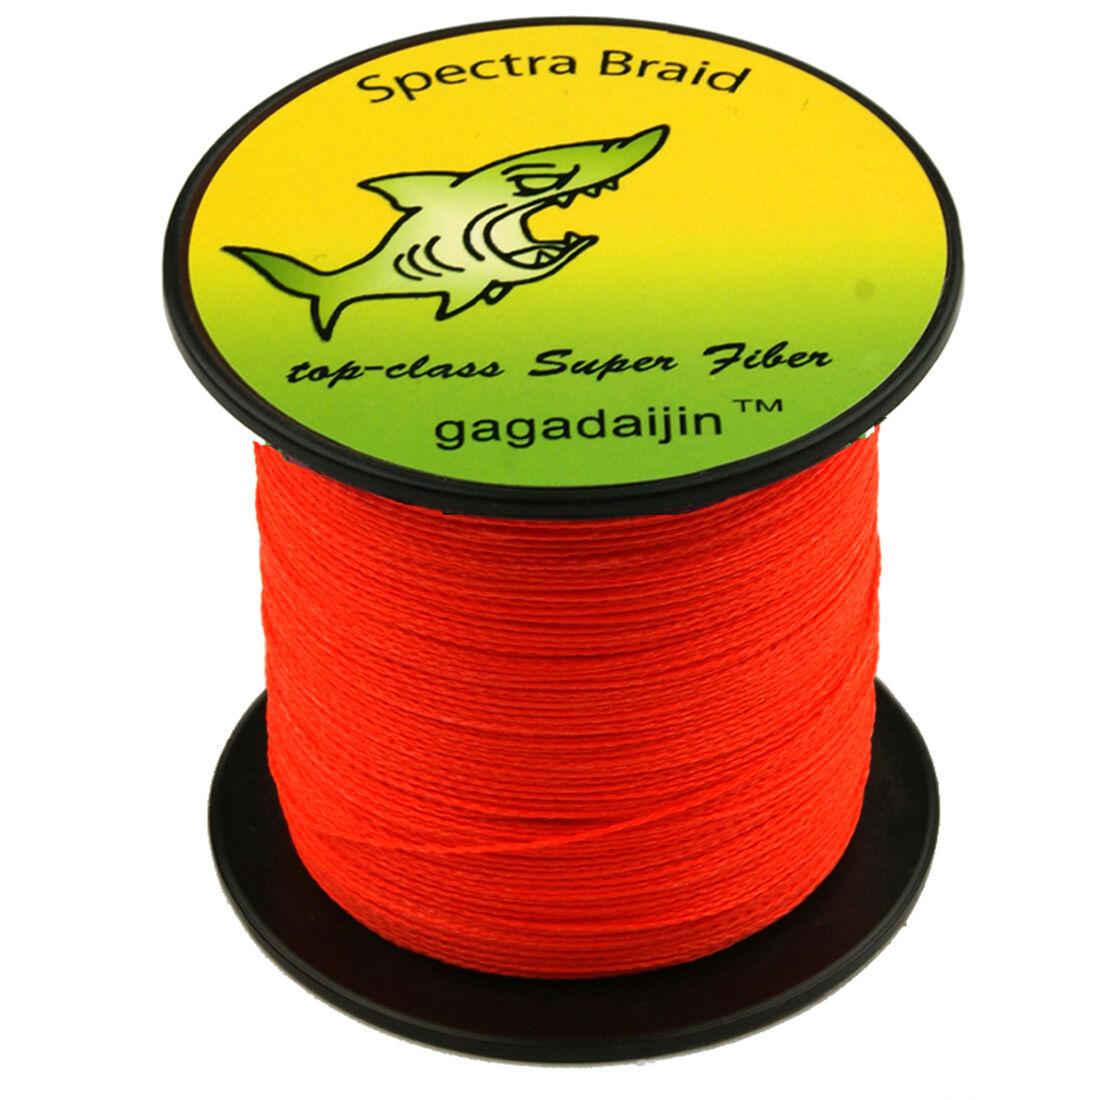 Pro 100% PE orange 100-1000M  6-300LB  Dyneema Power Super Braid Fishing Line  more order